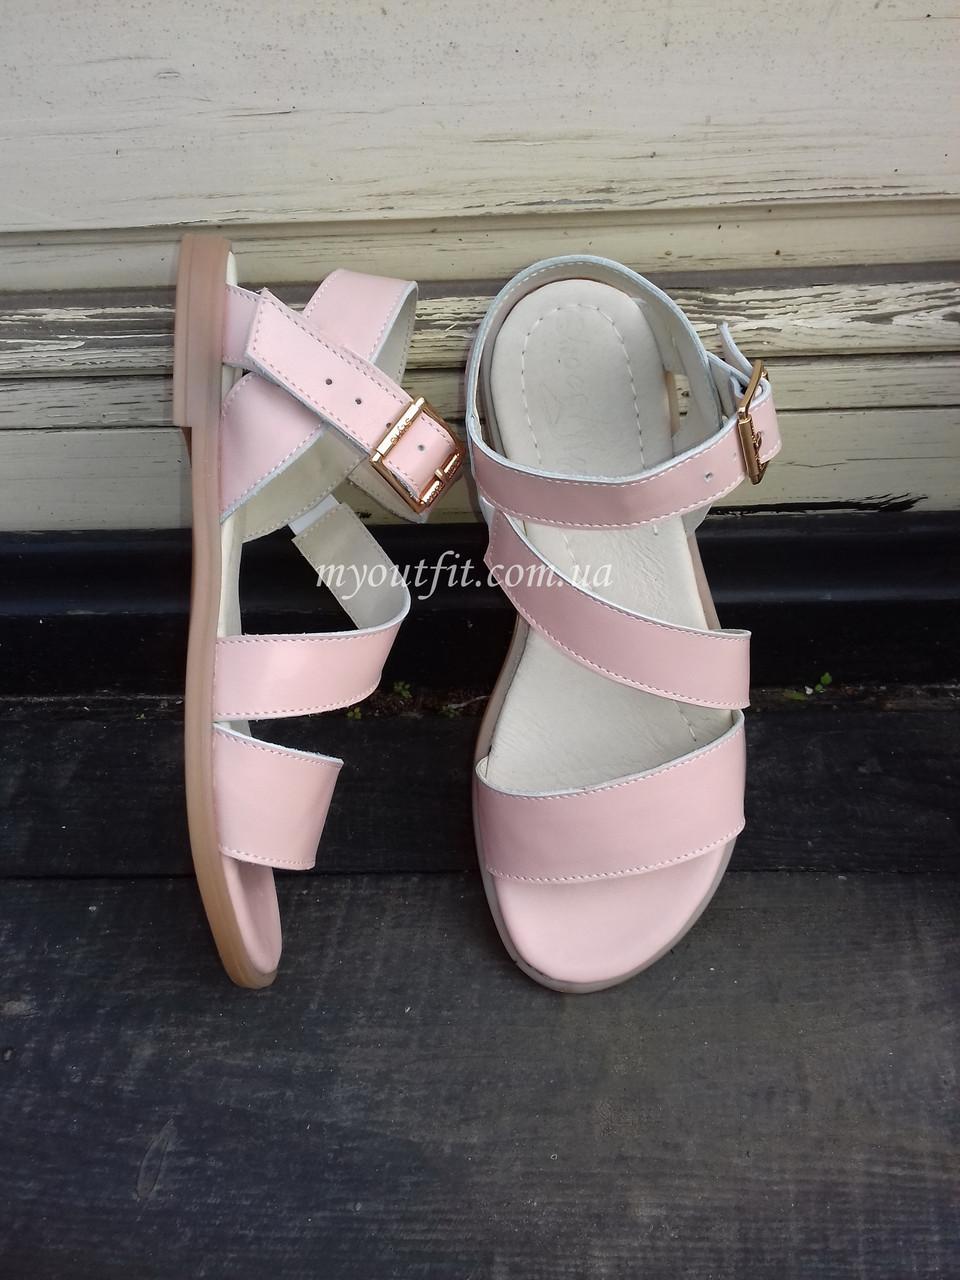 Женские сандалии кожаные Пудра Размер 37